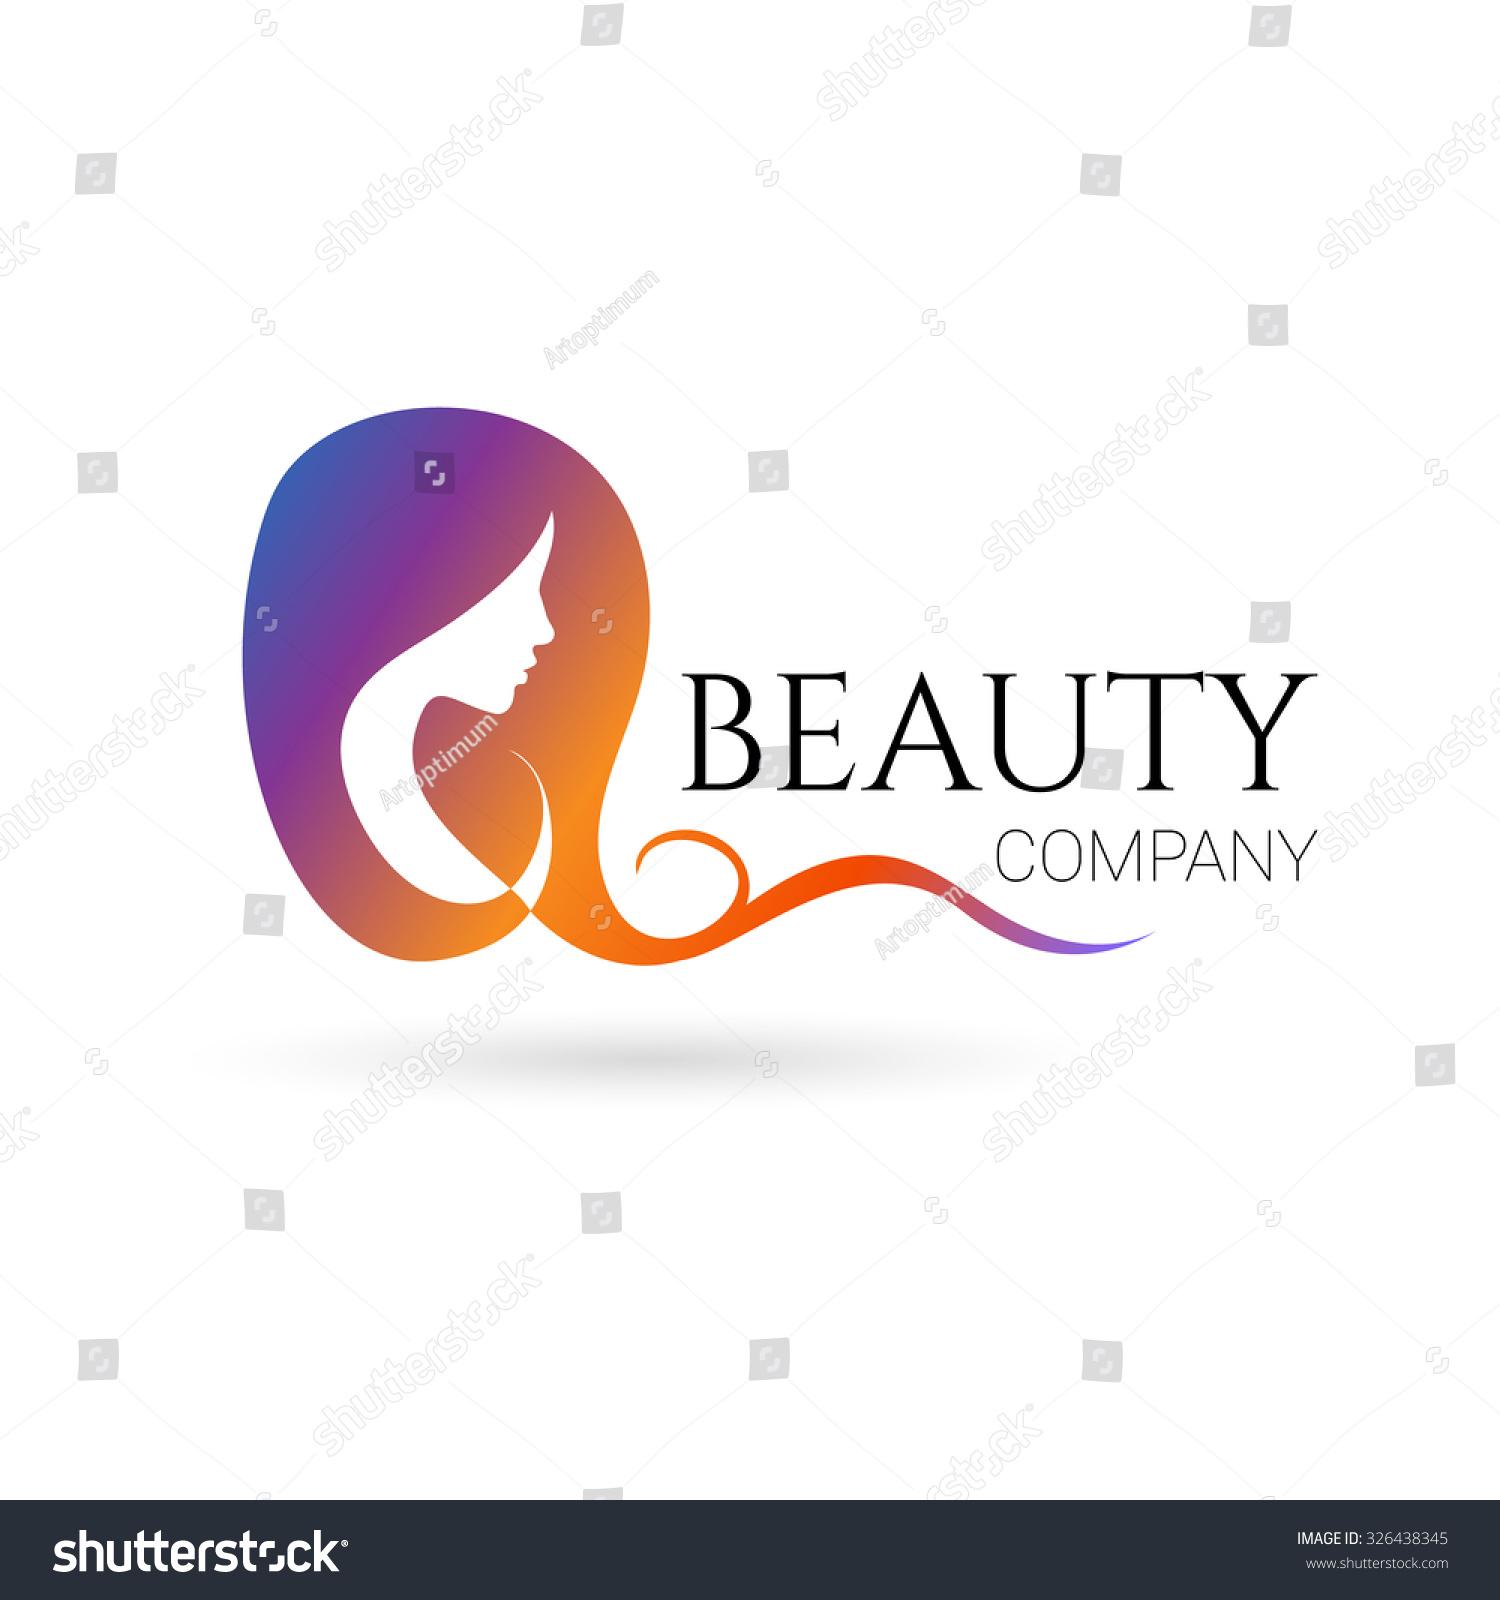 Logo beauty salon company female face stock illustration for Hair salon companies